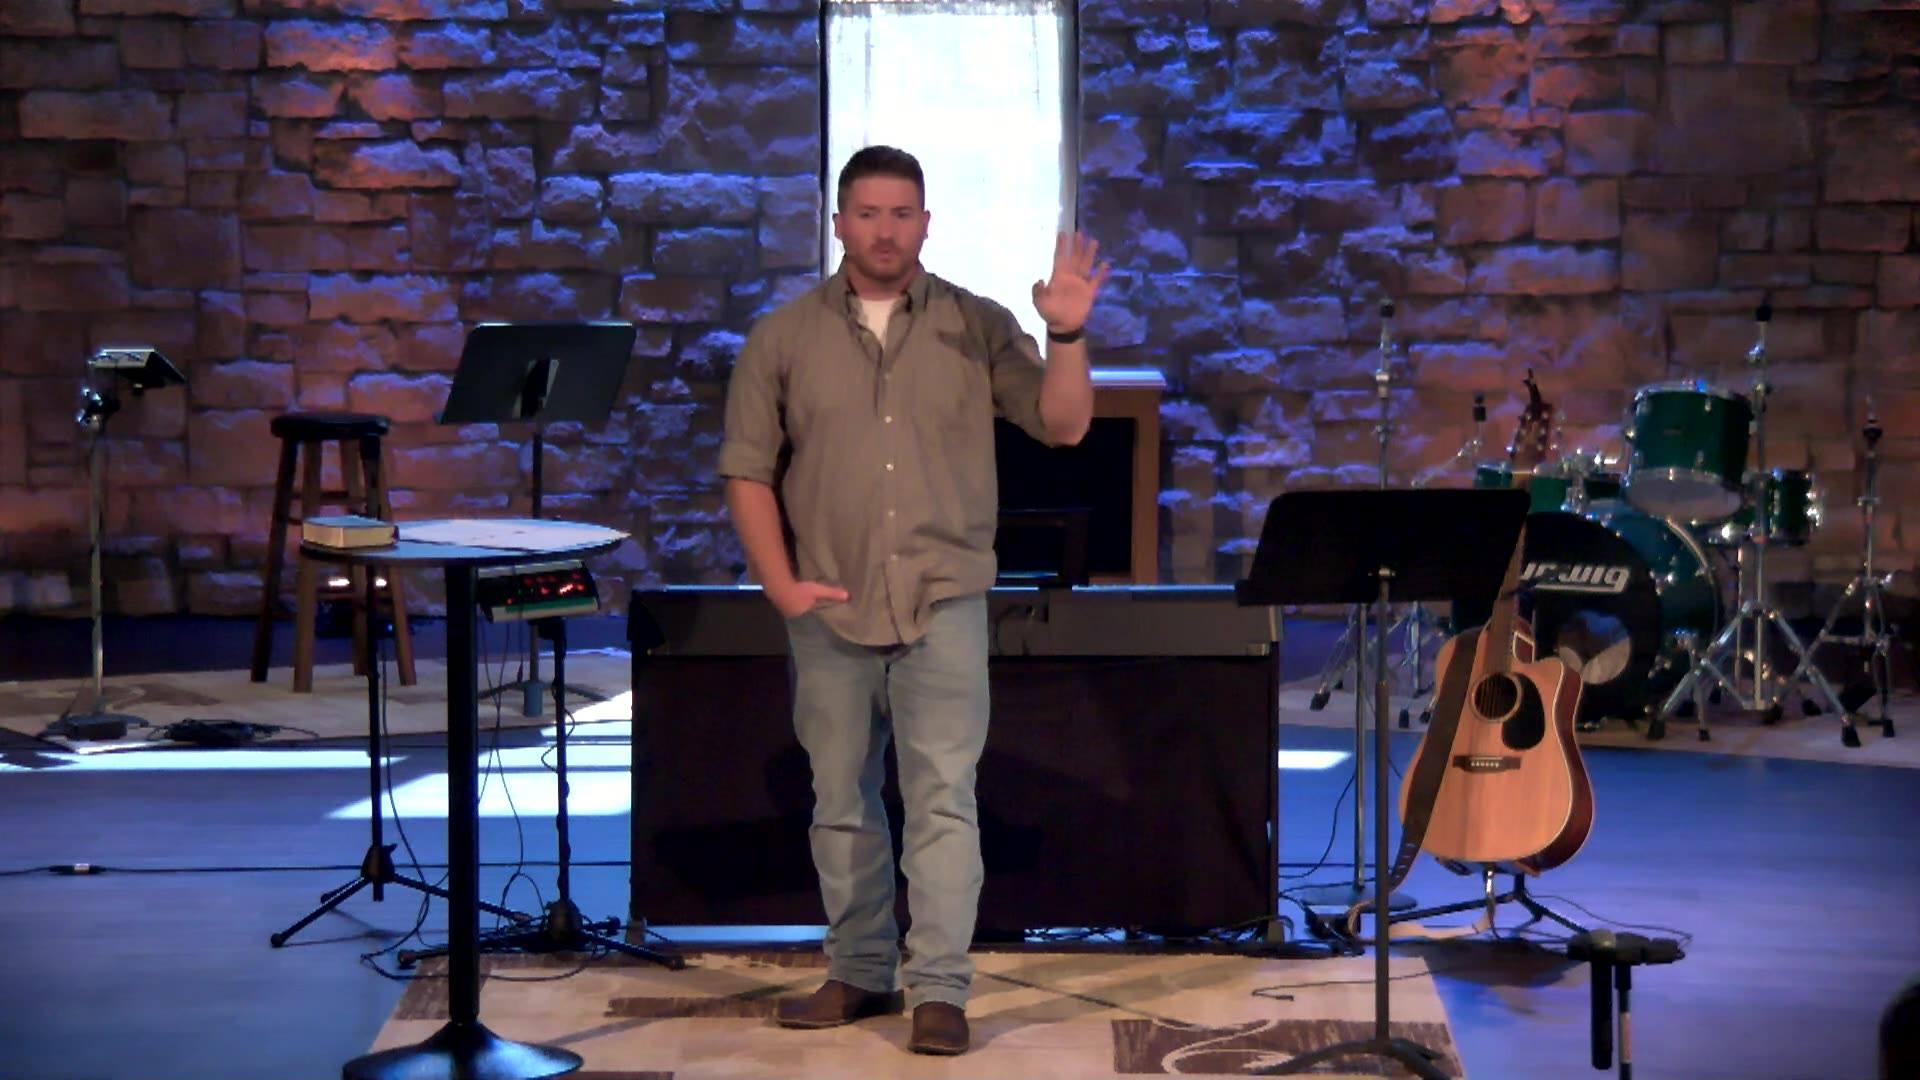 Hot Topics: Spiritual Gifts